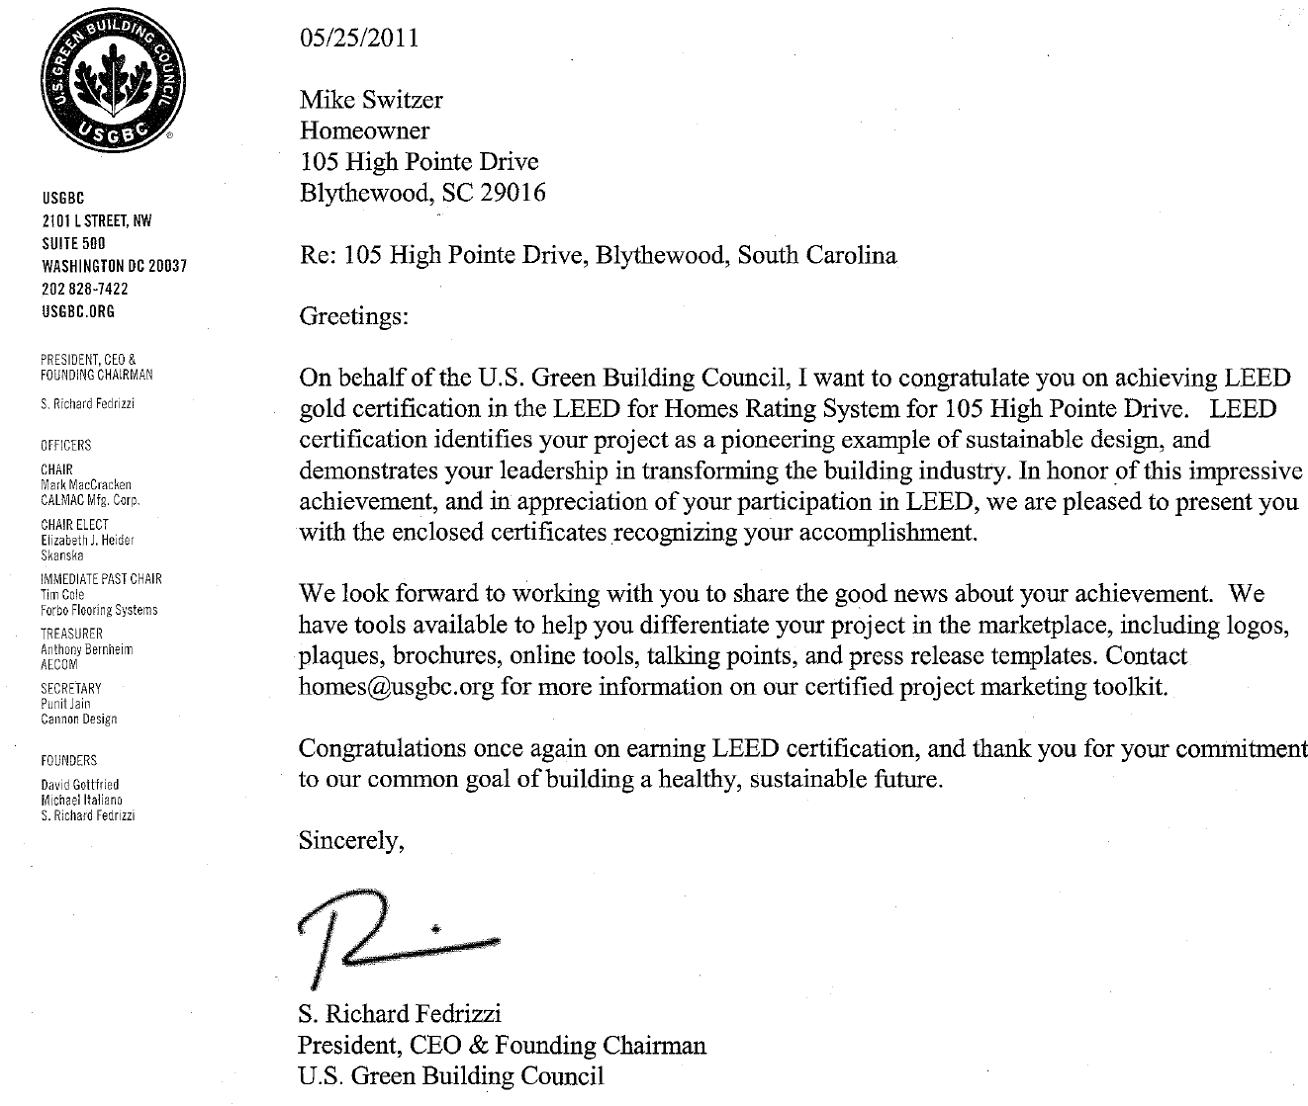 Cornell Cover Letter Images - Cover Letter Sample